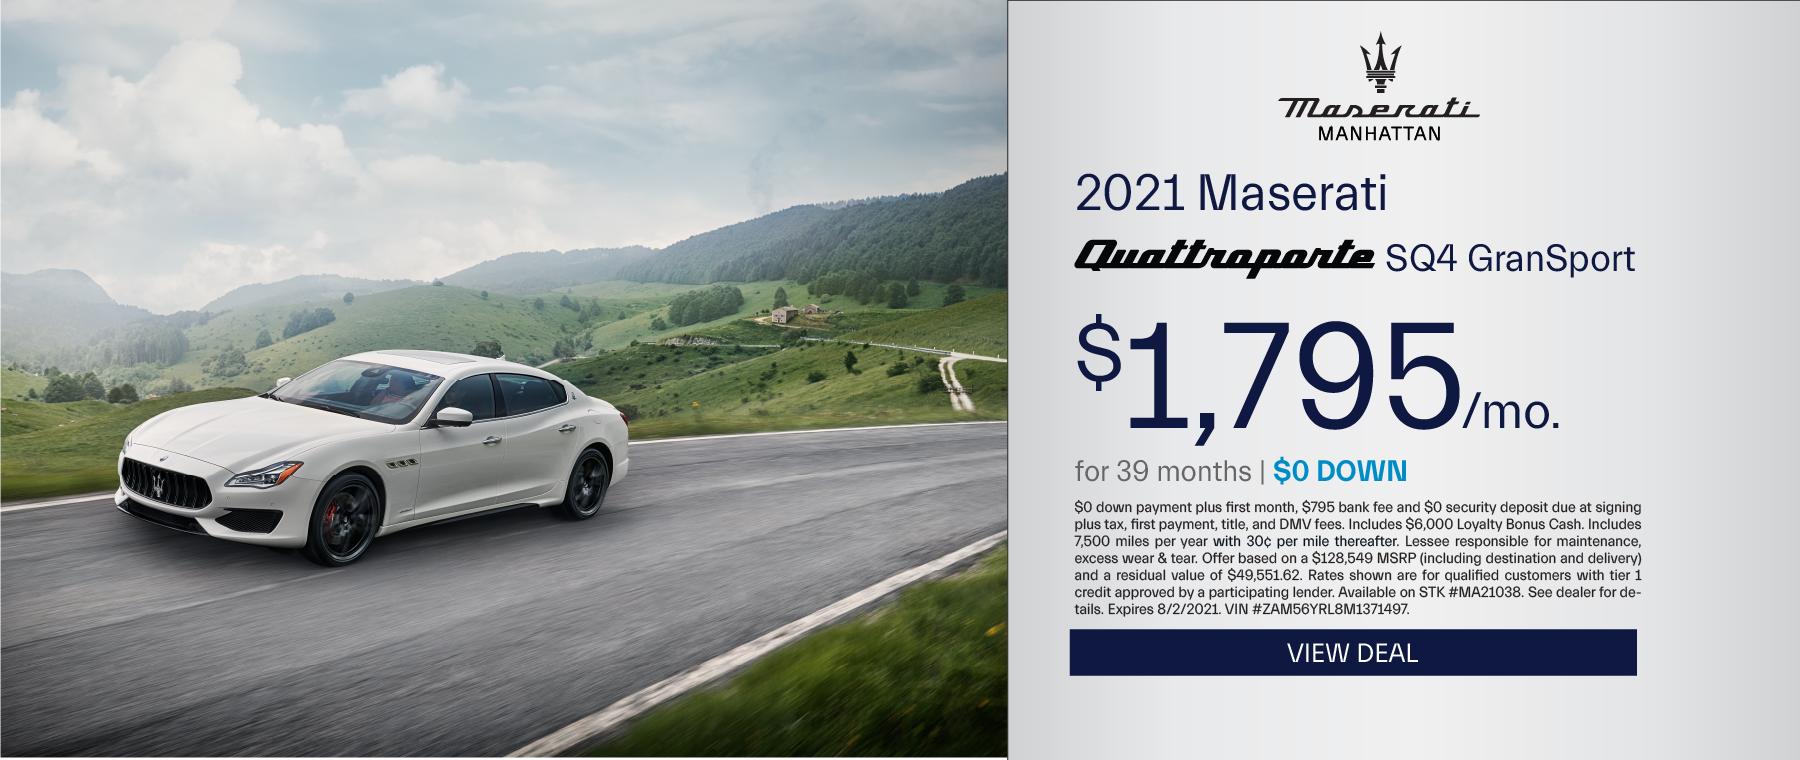 Maserati of Manhattan – 2020 Quattroporte – July 2021